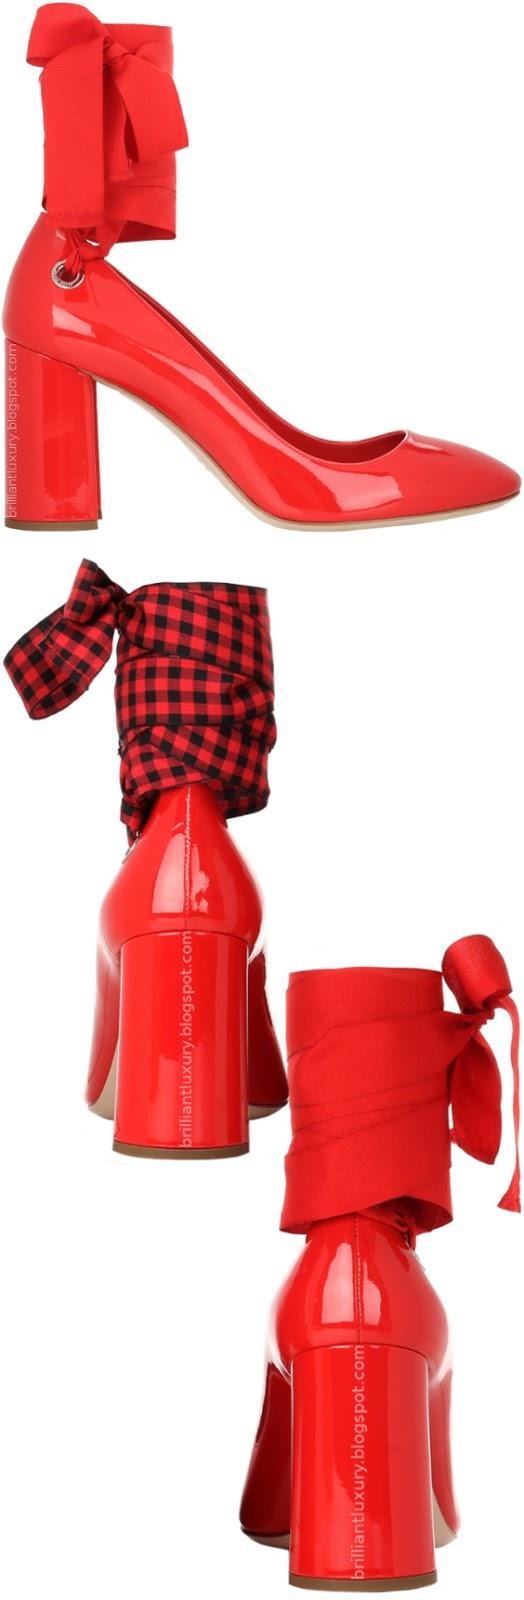 Brilliant Luxury ♦ Miu Miu red patent leather pumps